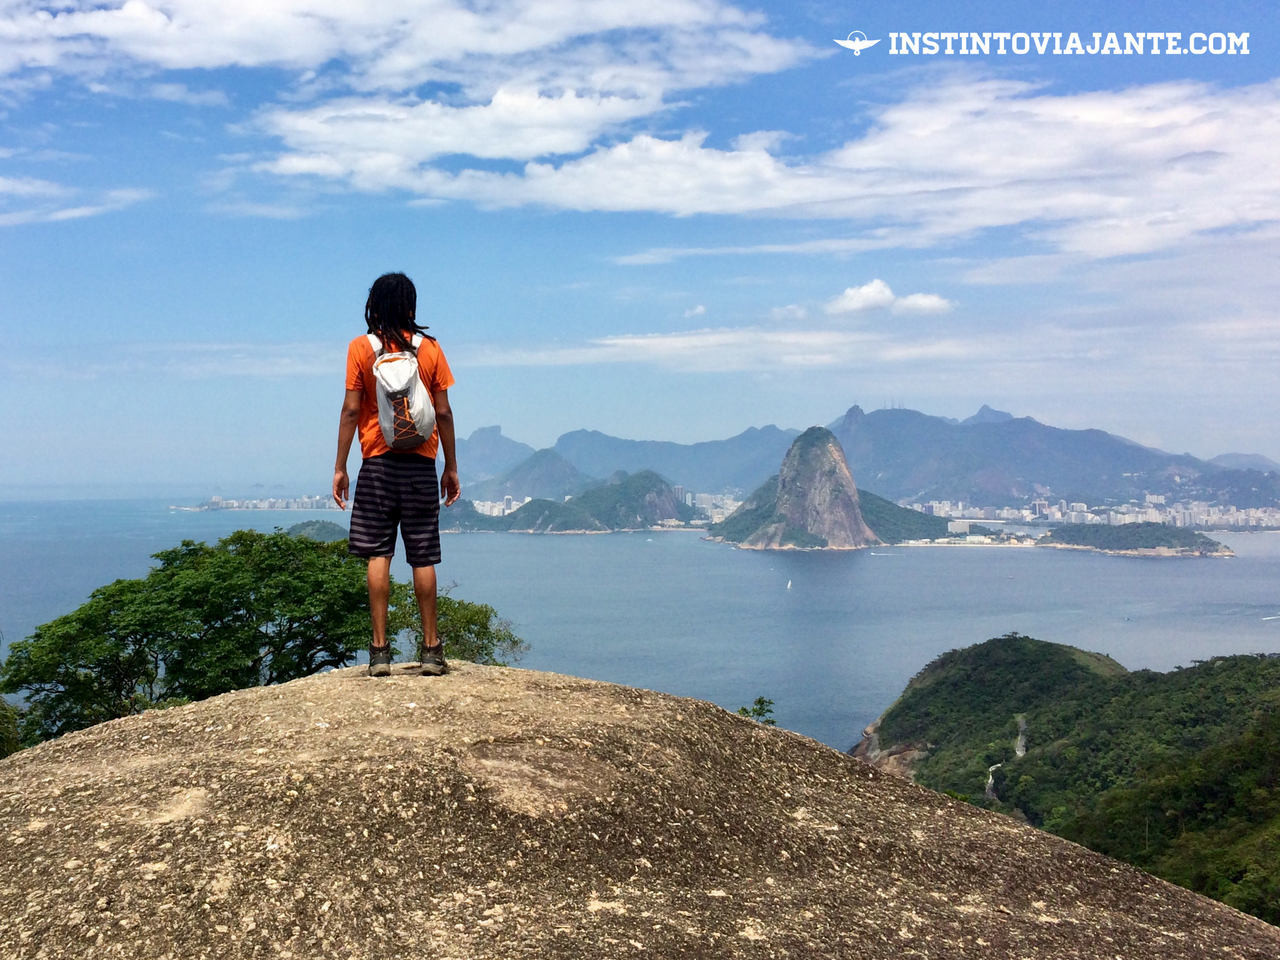 As 50 melhores cidades brasileiras para se viver (segundo a ONU)